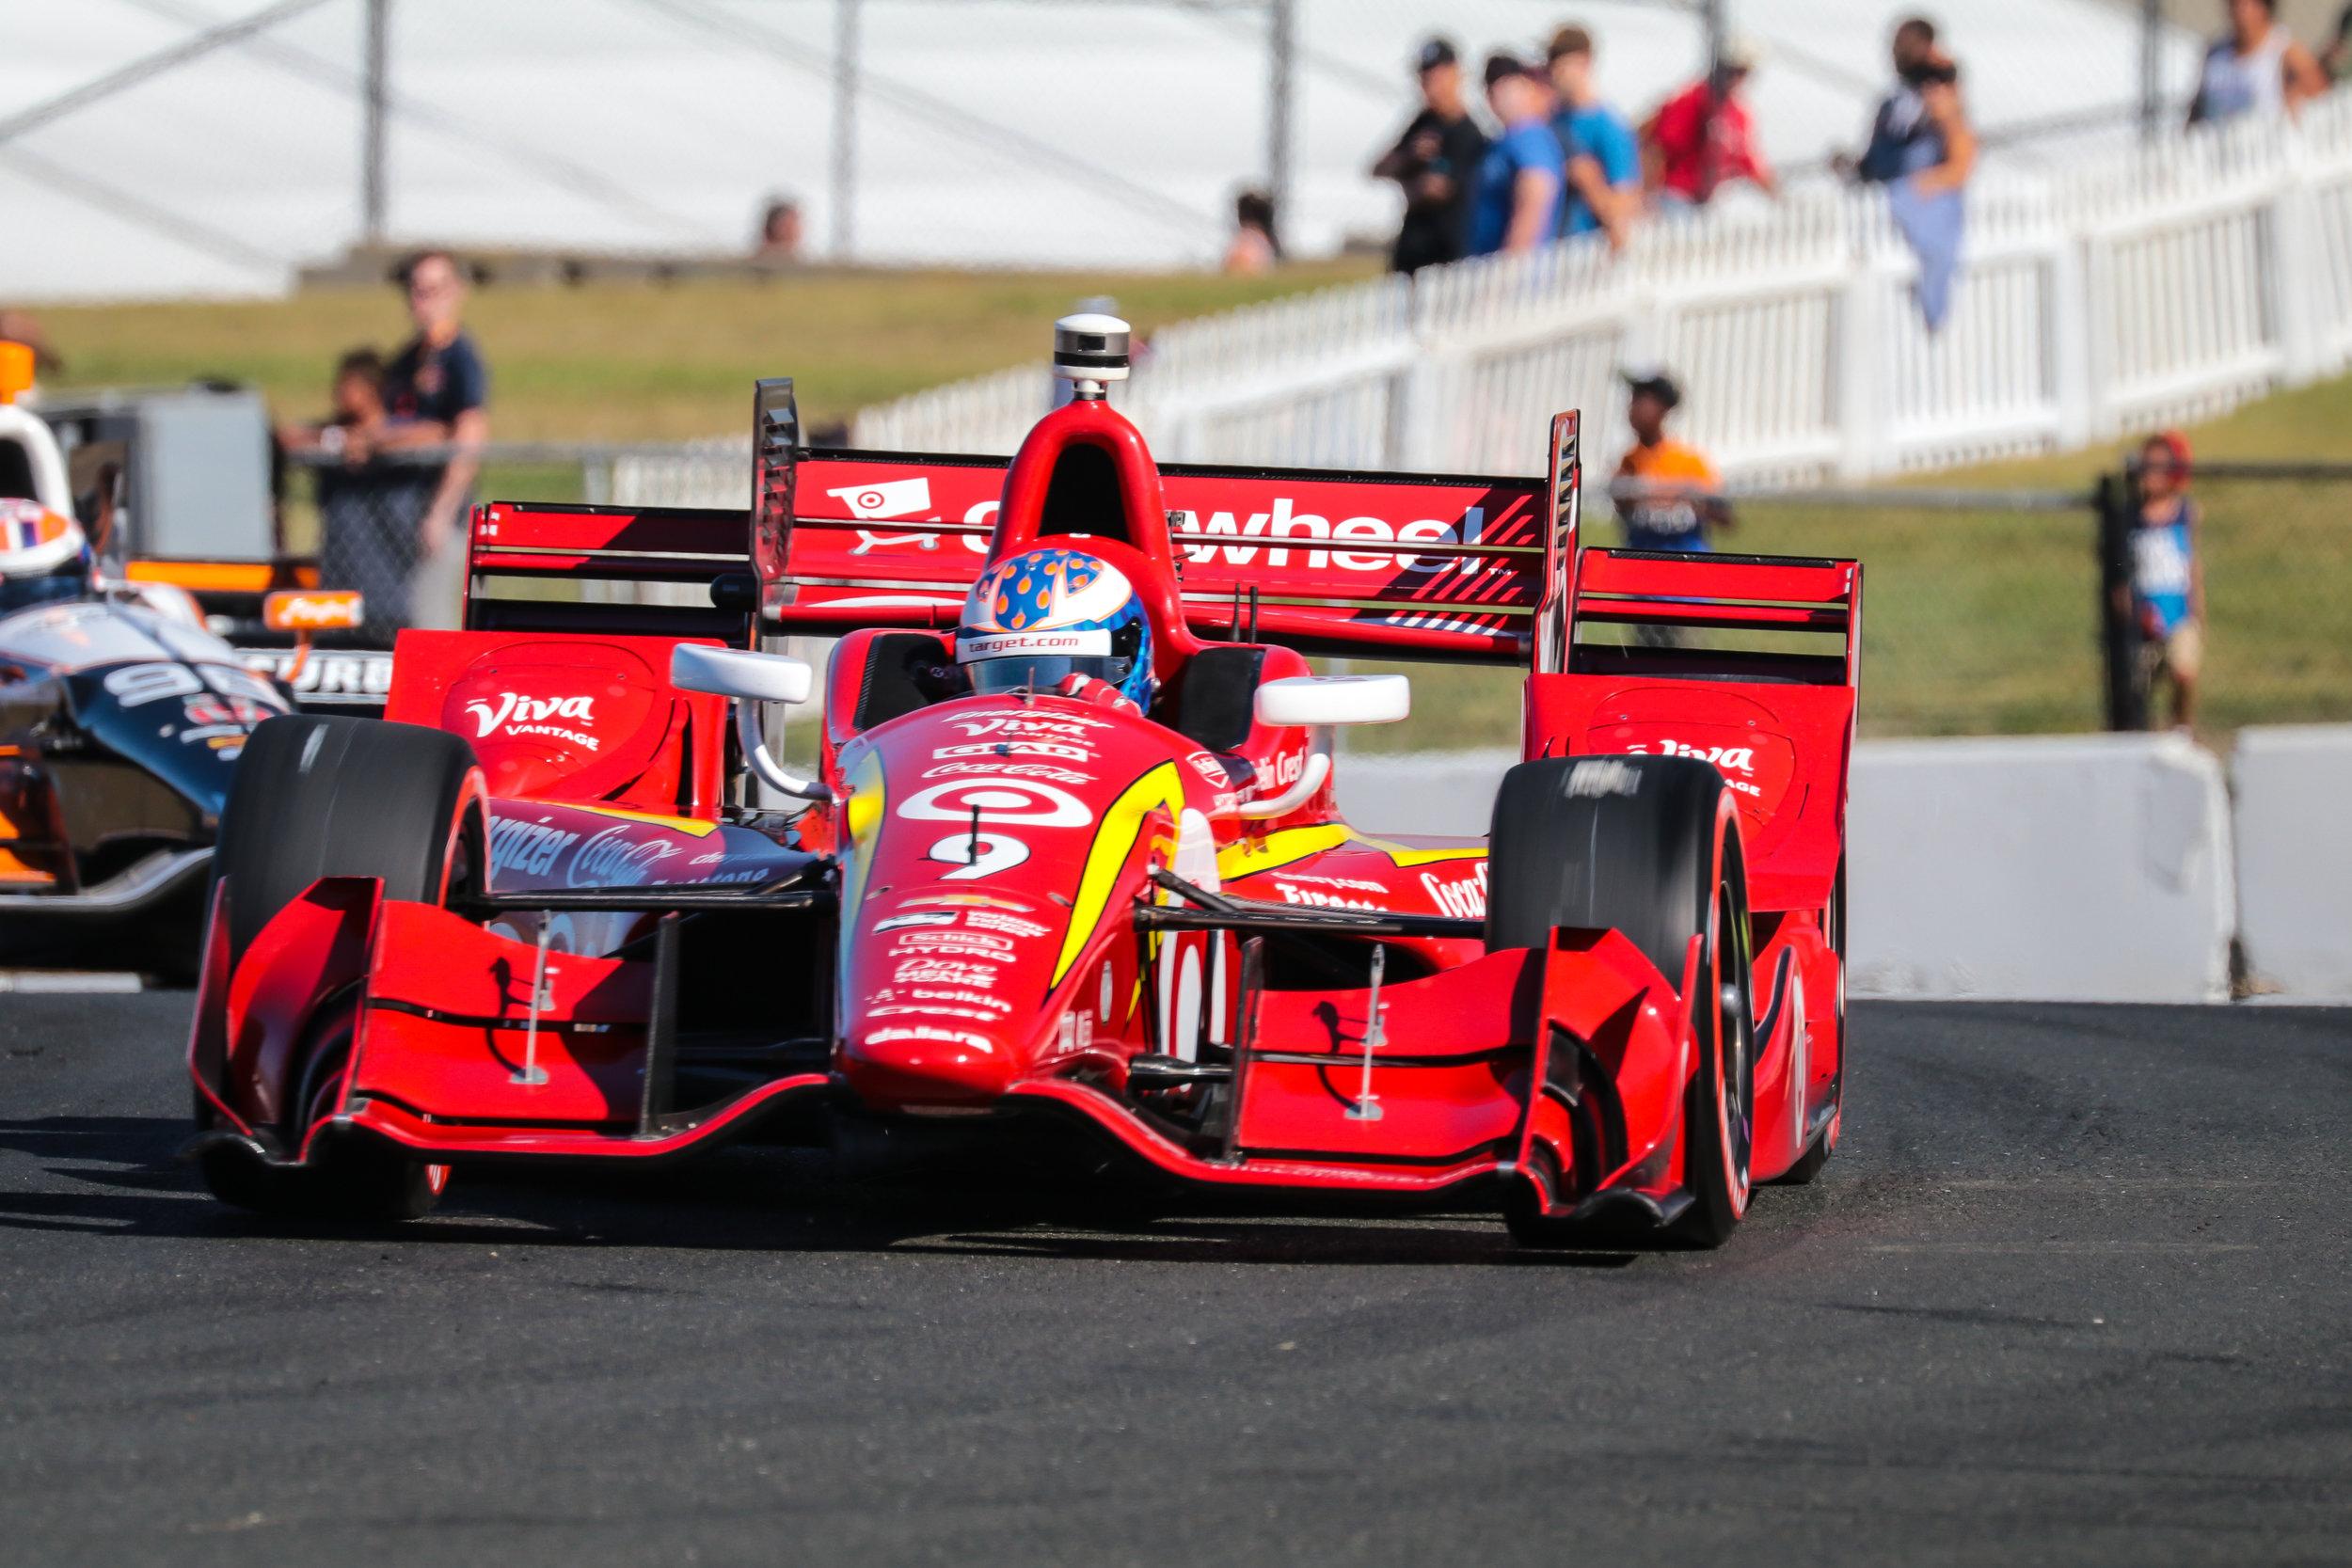 Indy16-2813.jpg